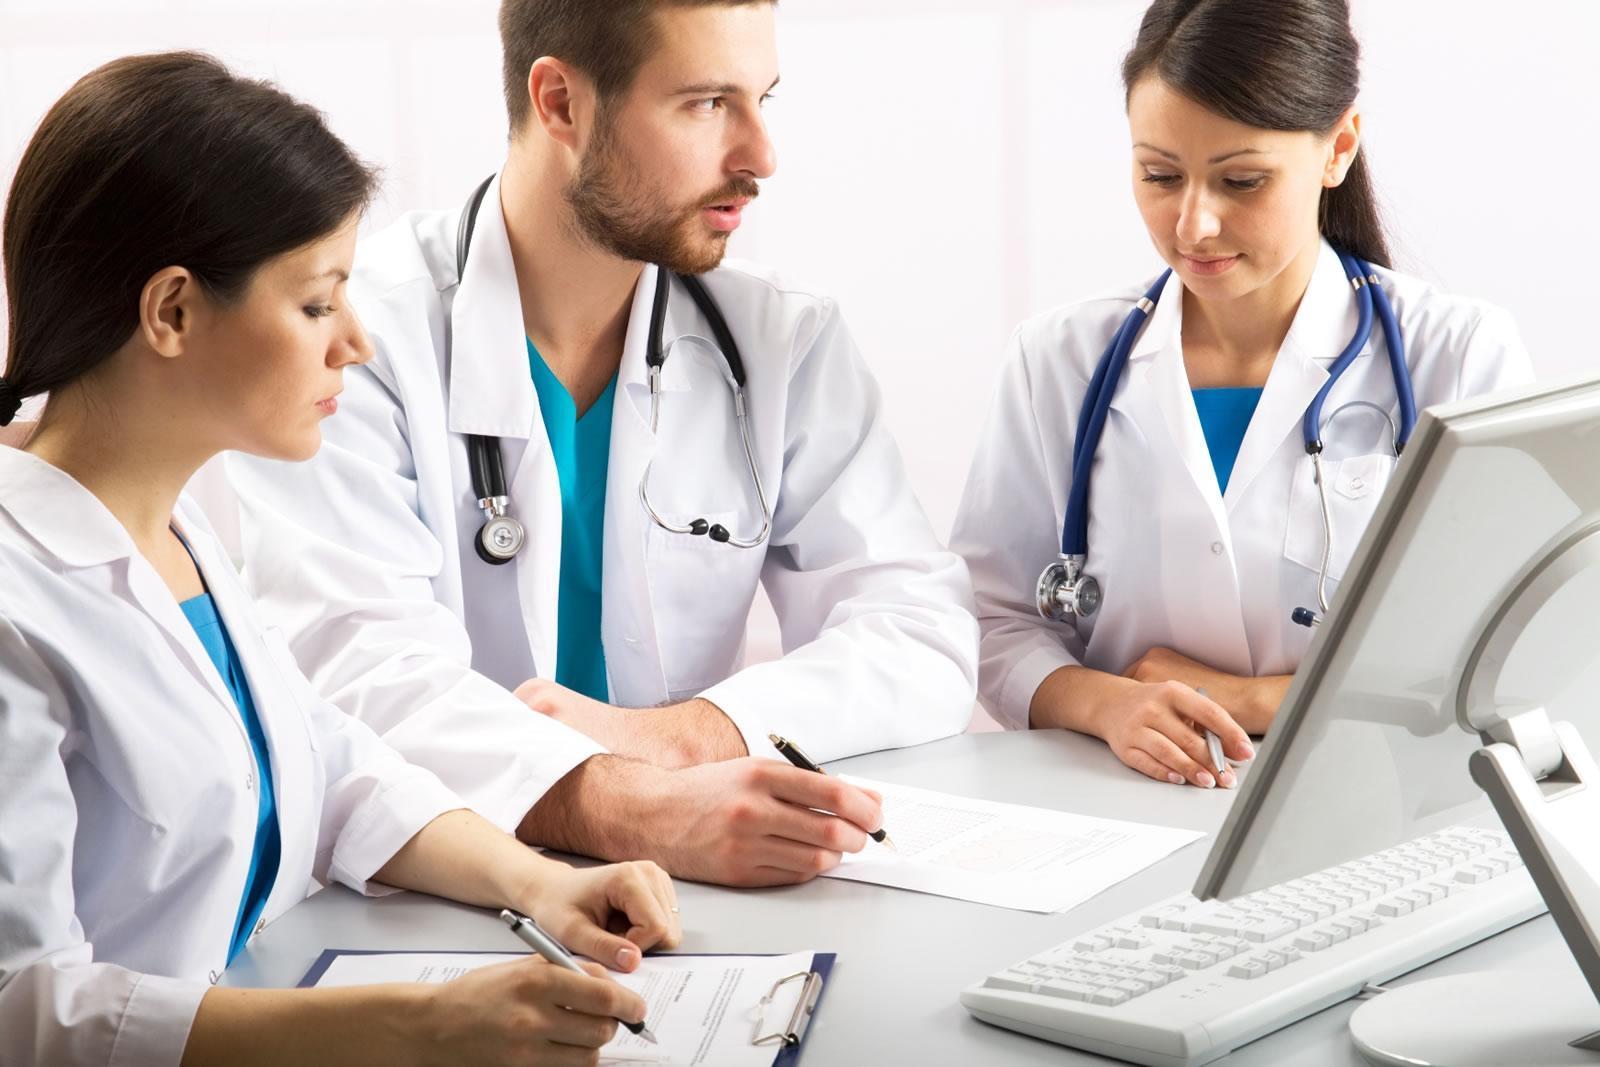 https://www.veritasprocure.co.uk/wp-content/uploads/2010/08/Clinical-Training-2.jpg